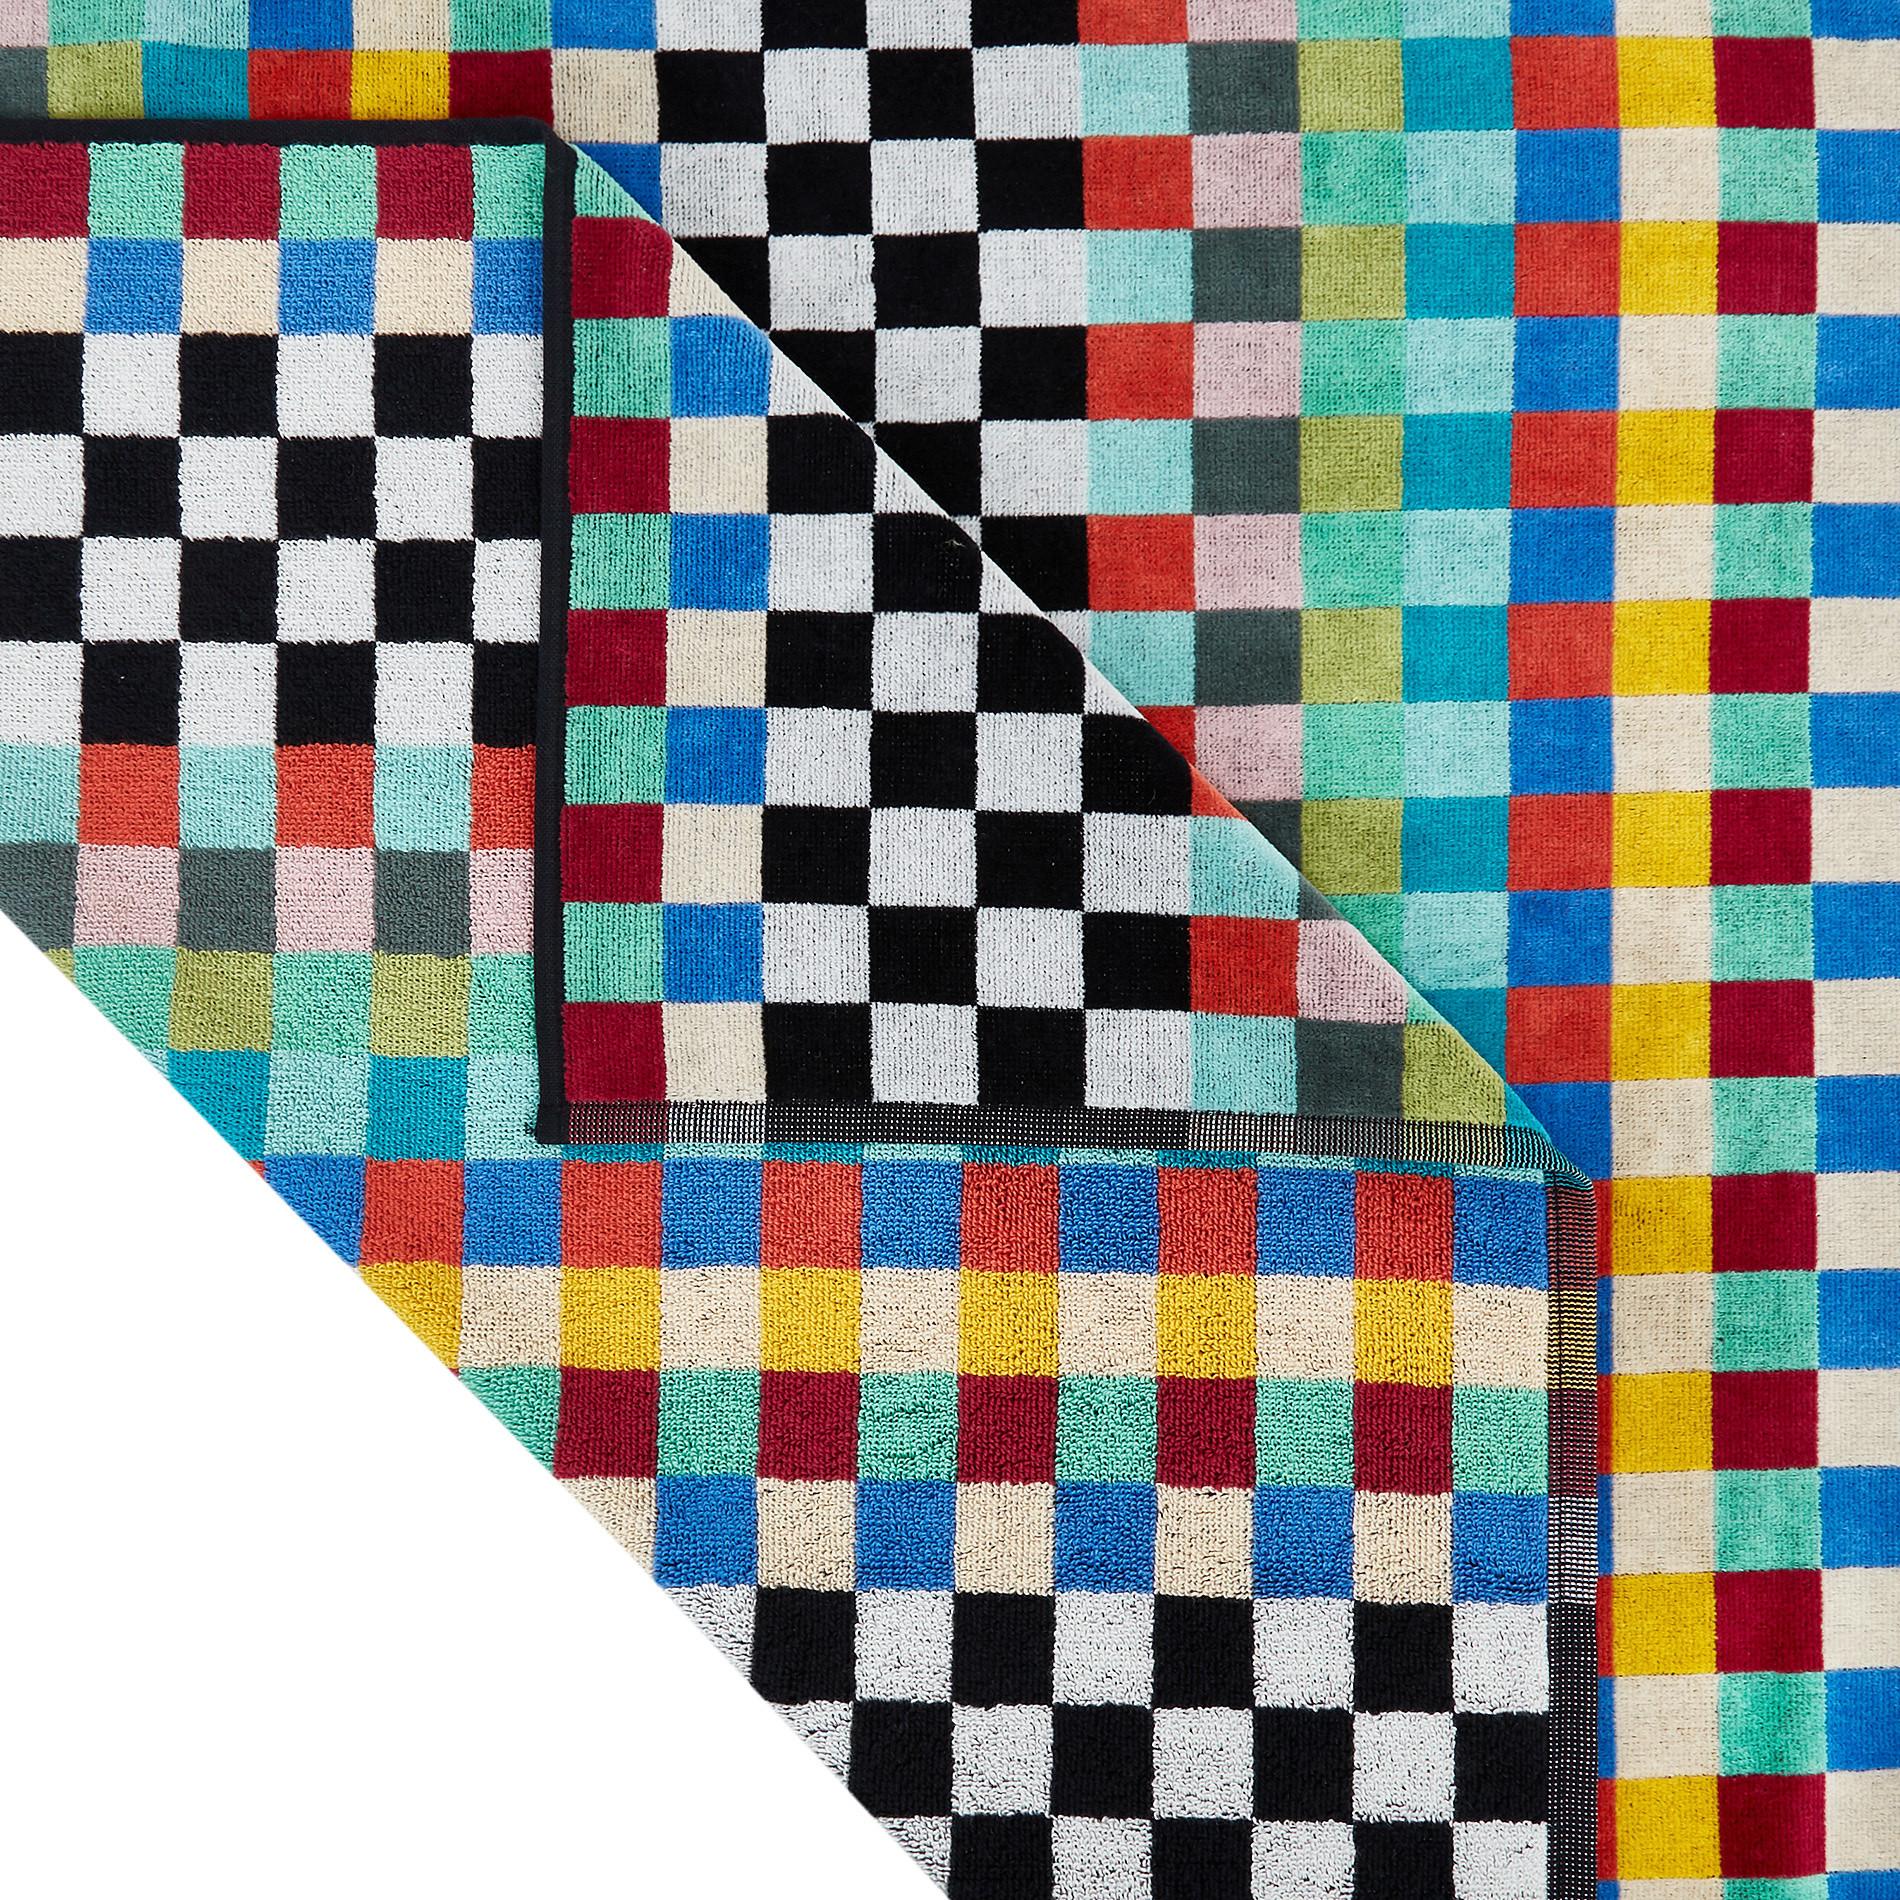 Telo mare cotone velour motivo check, Multicolor, large image number 1